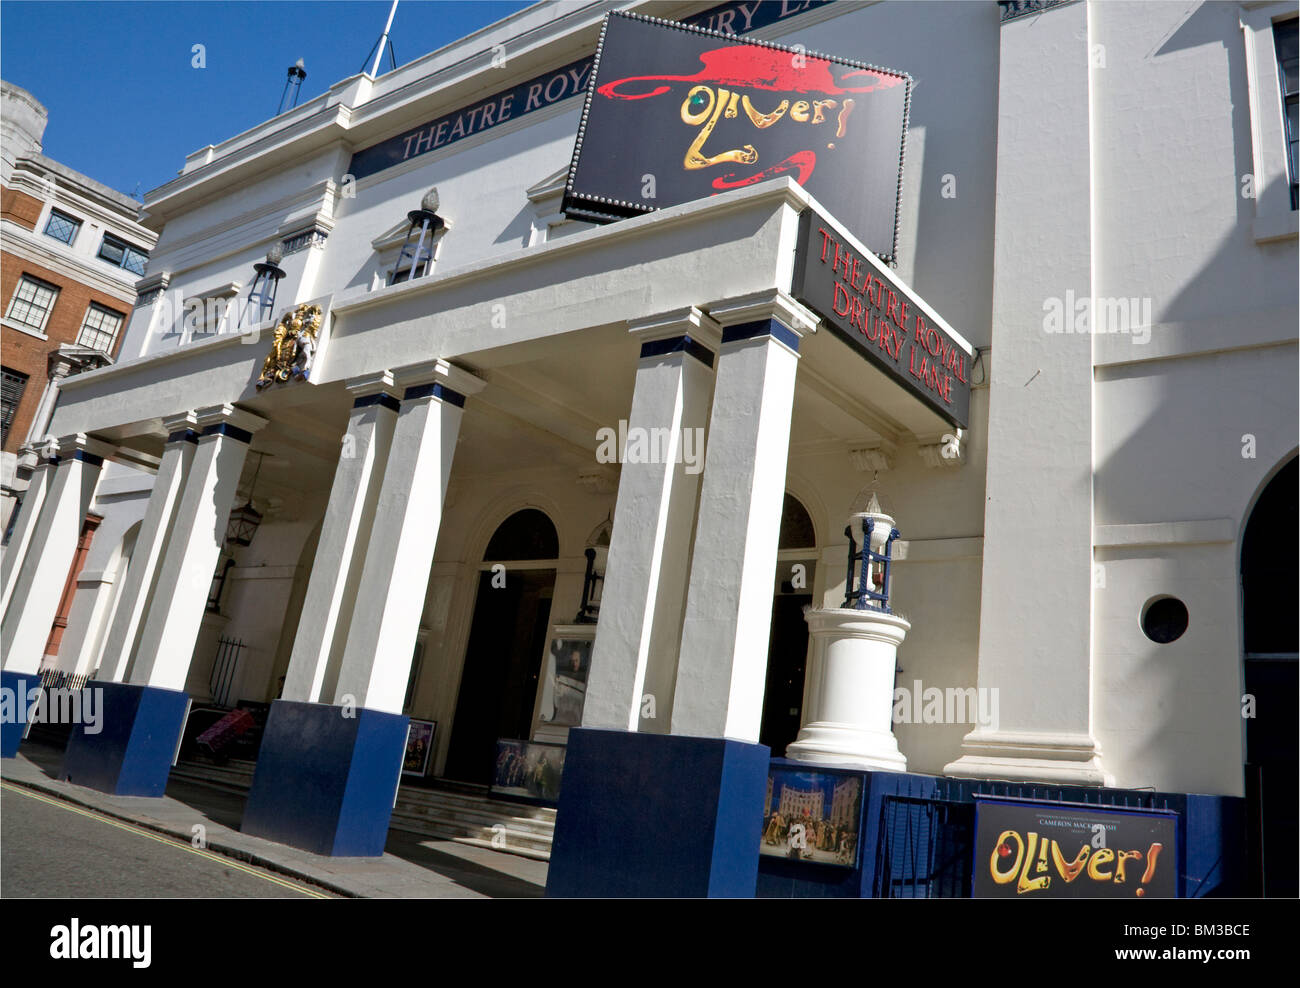 Theatre Royal Drury Lane, London - Stock Image